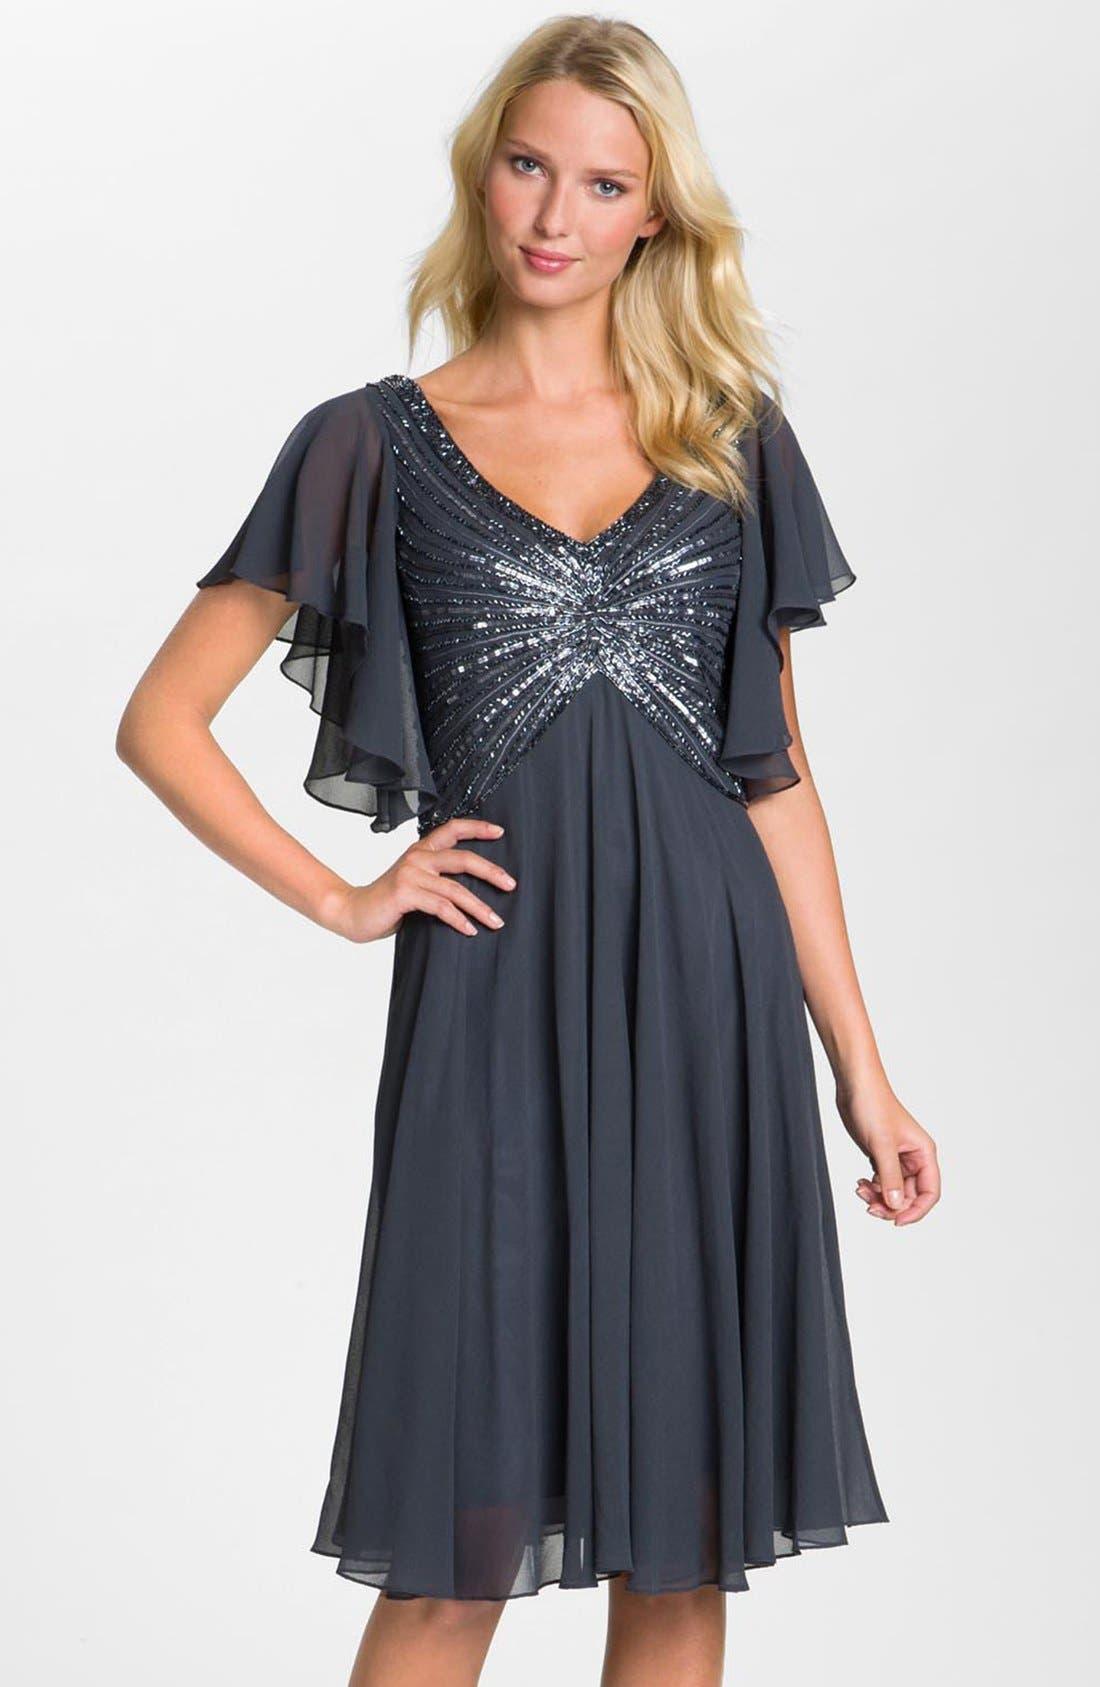 Alternate Image 1 Selected - J Kara V-Neck Sequin Bodice Dress